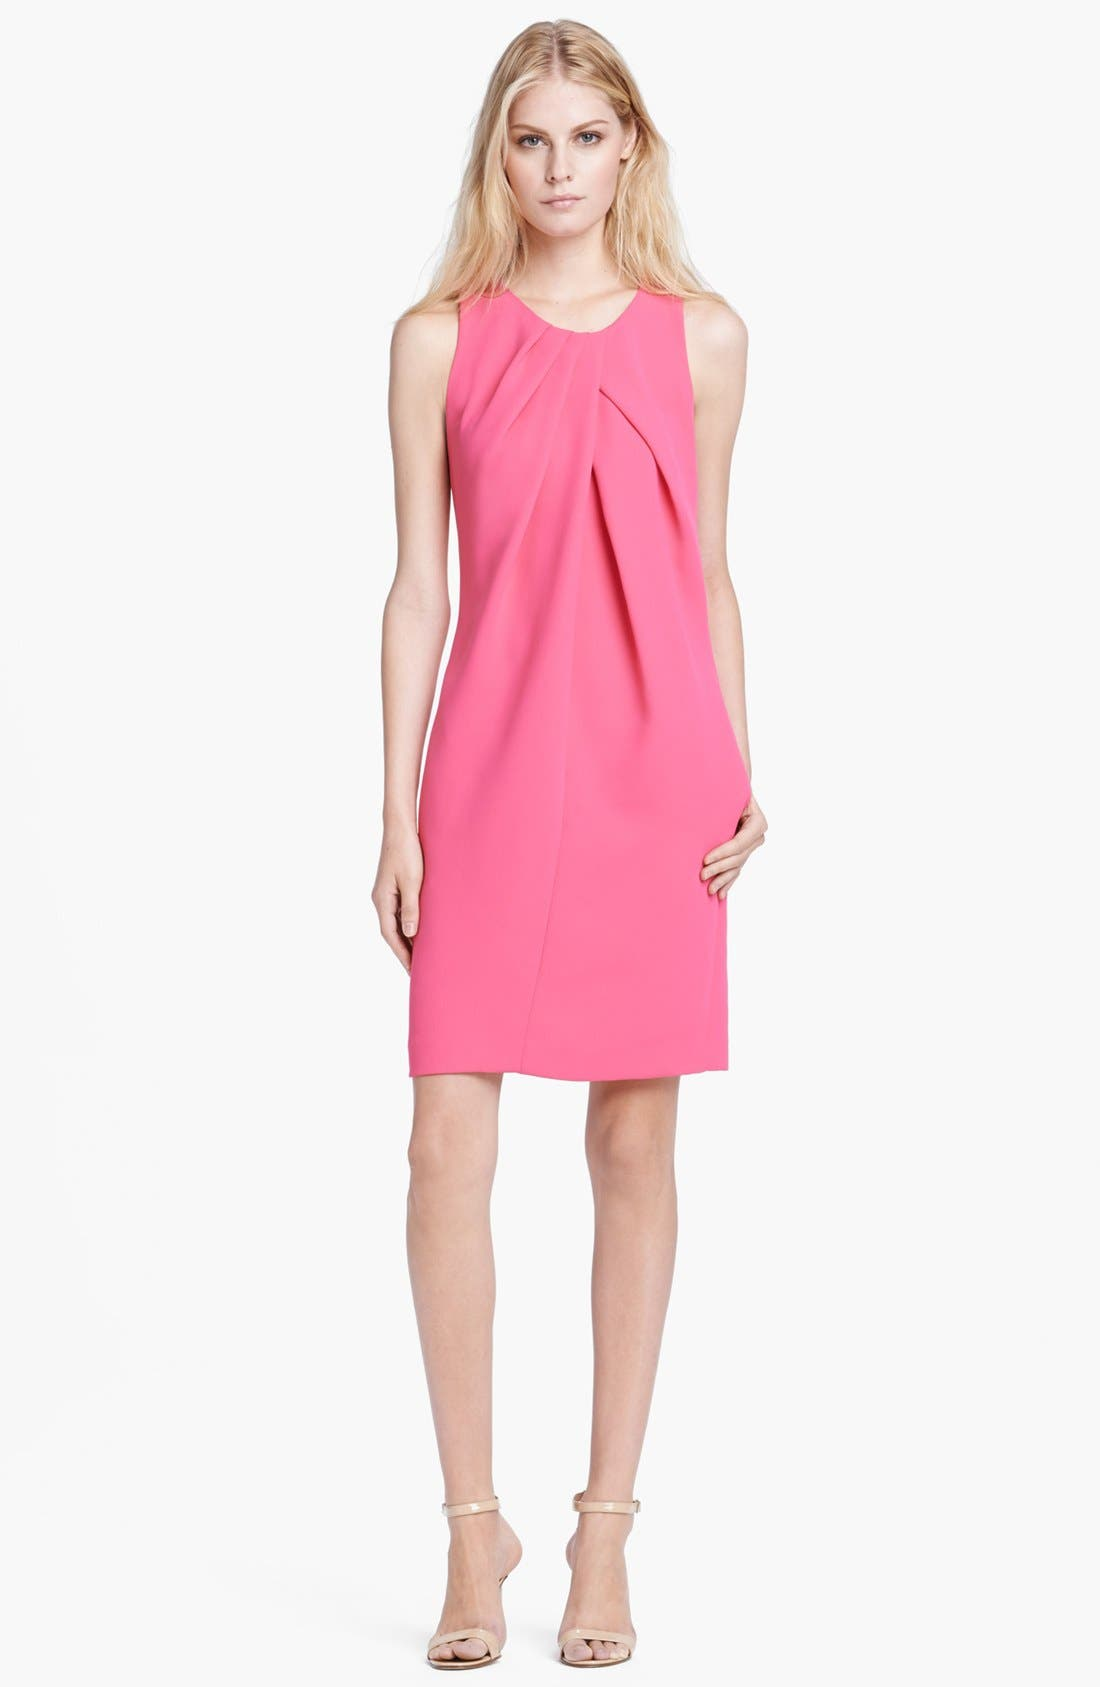 Alternate Image 1 Selected - L'AGENCE Sleeveless Drape Front Dress